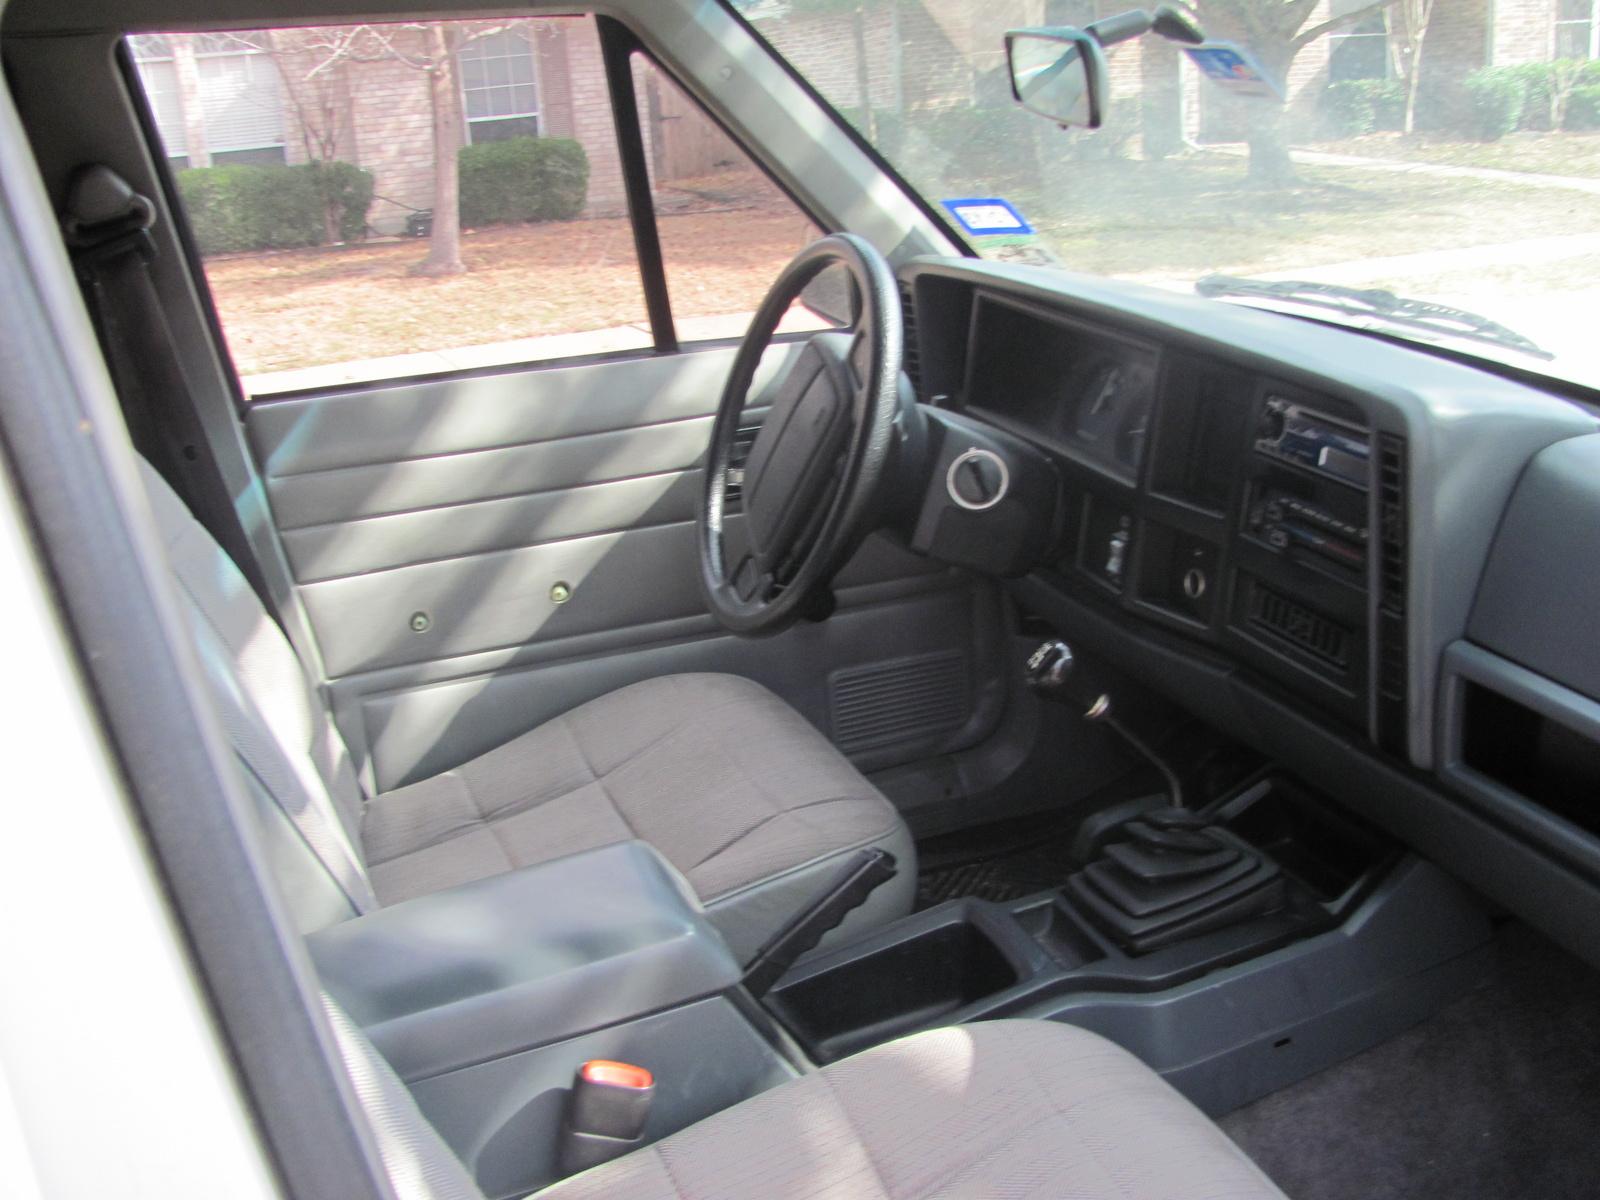 1996 jeep cherokee interior pictures cargurus - 1996 jeep grand cherokee interior ...